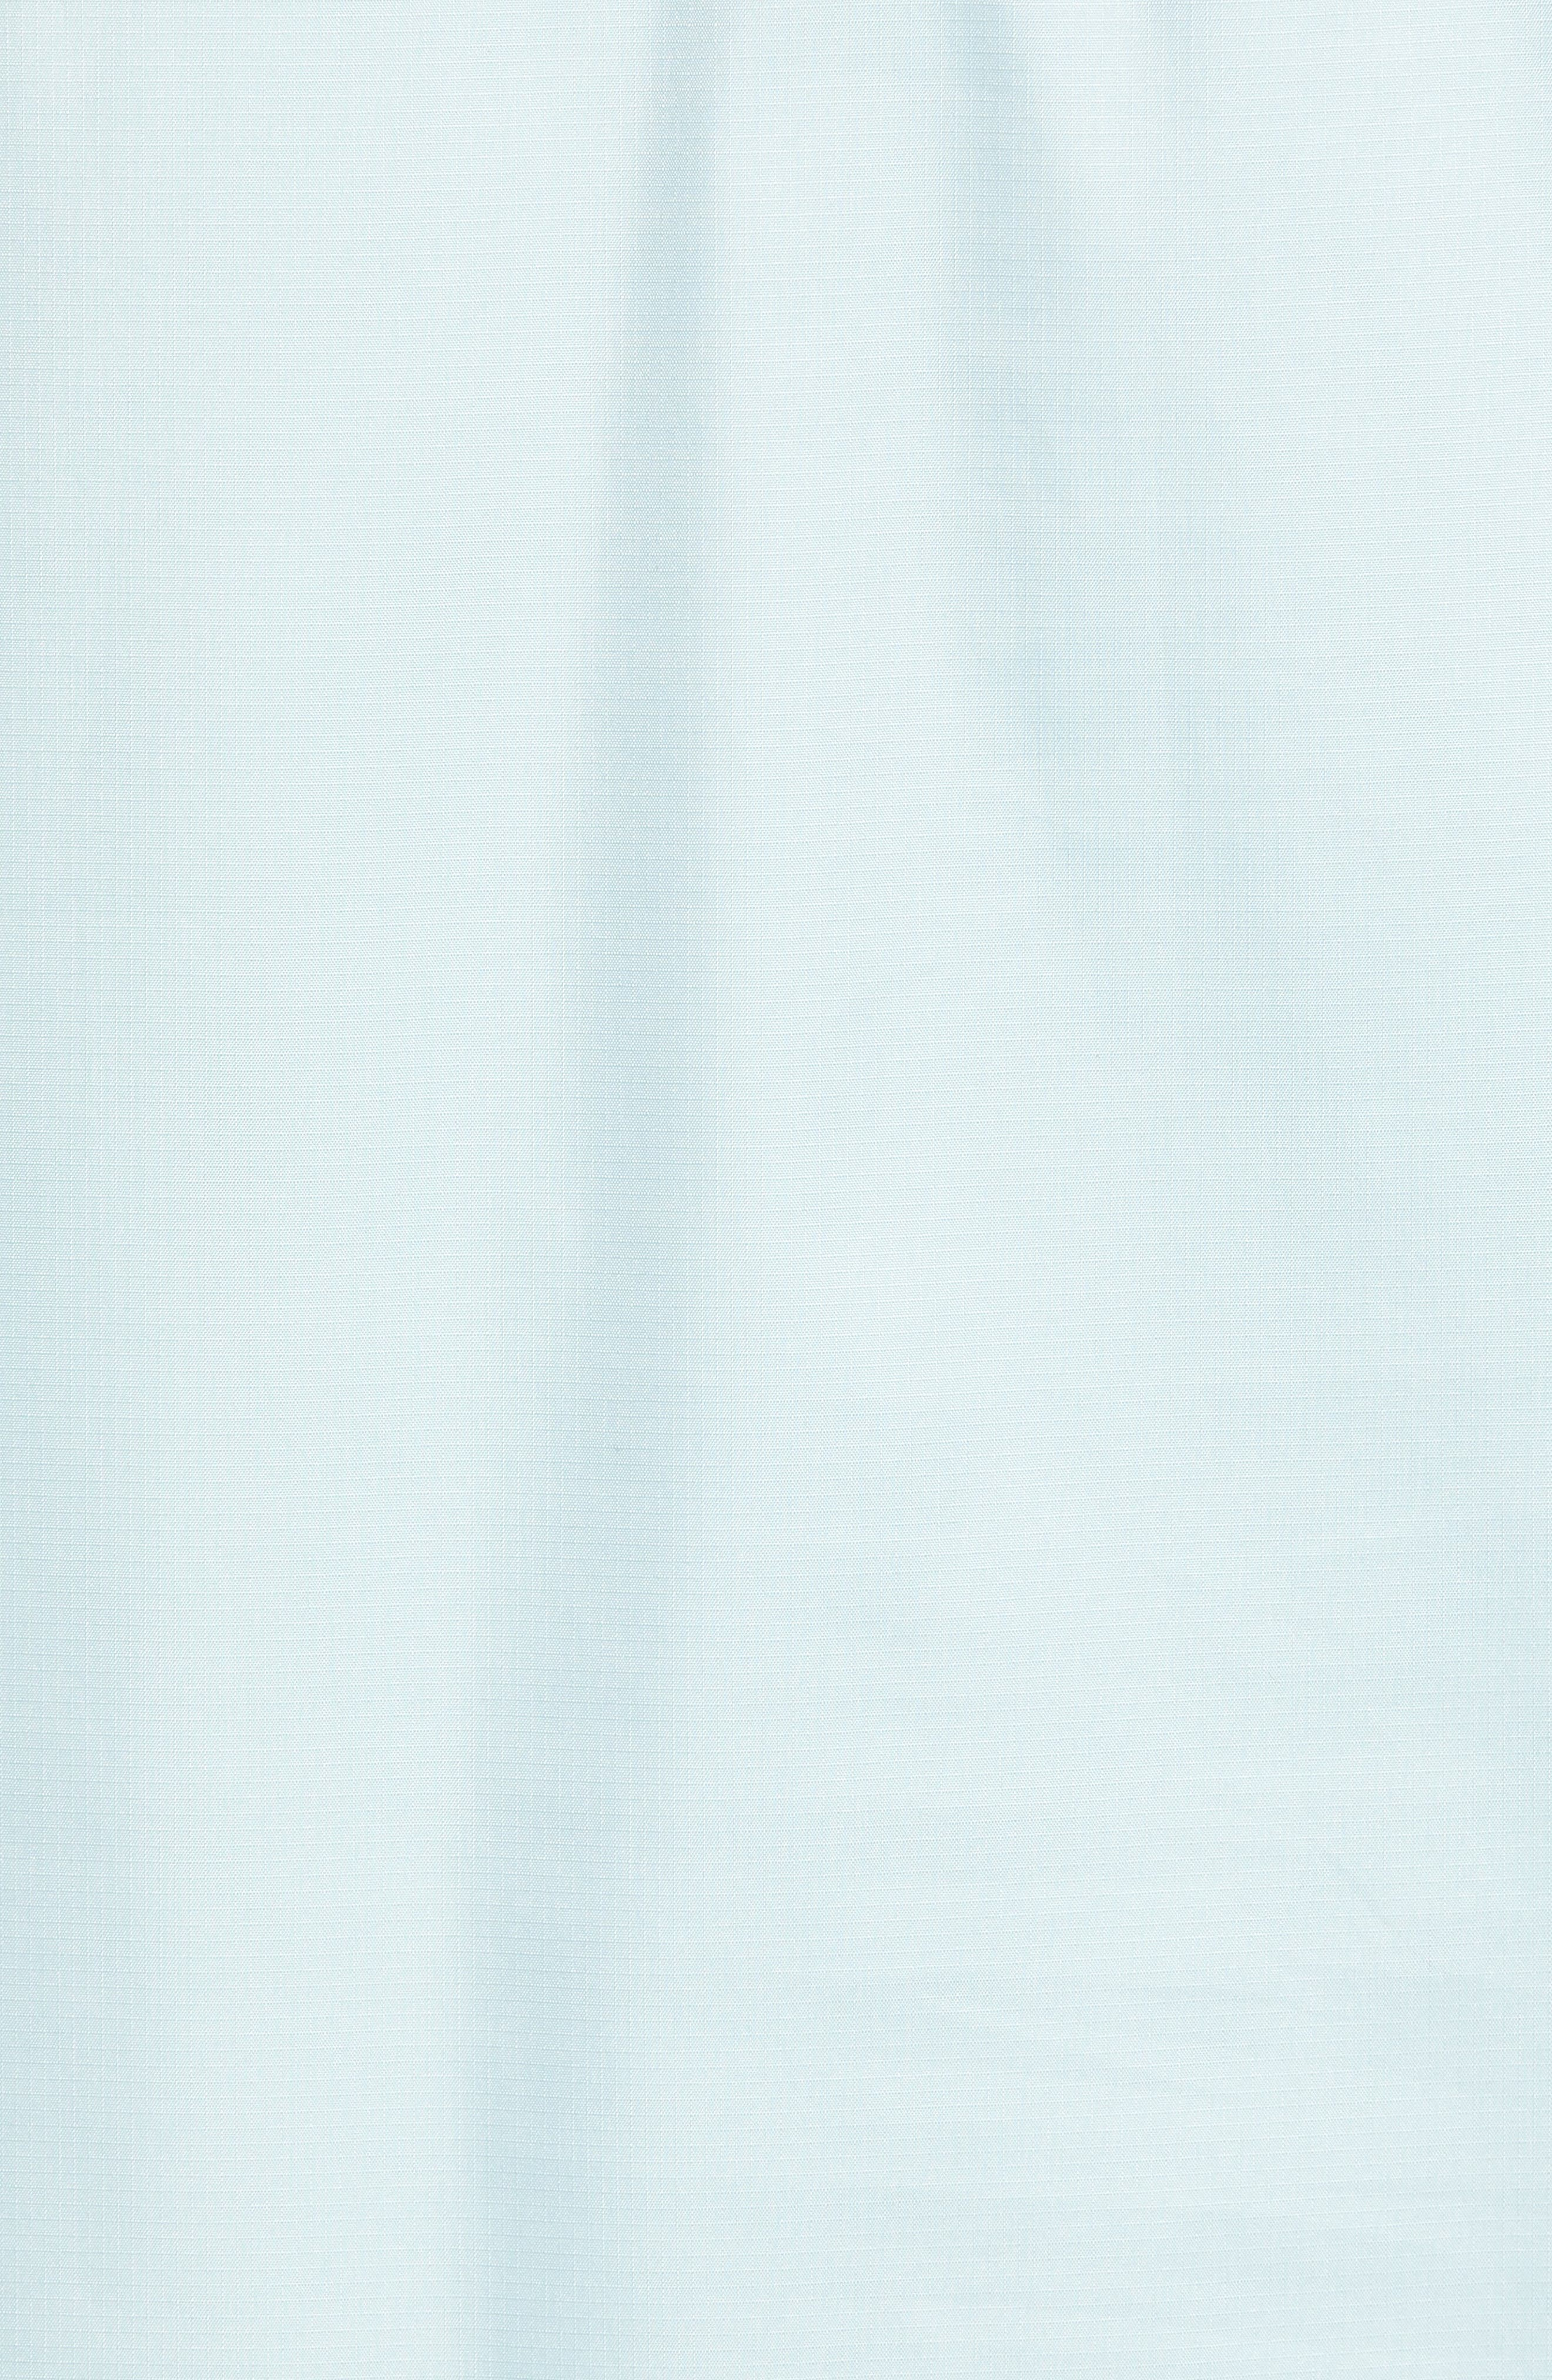 Fanorak Pullover,                             Alternate thumbnail 4, color,                             Blue Haze Multi